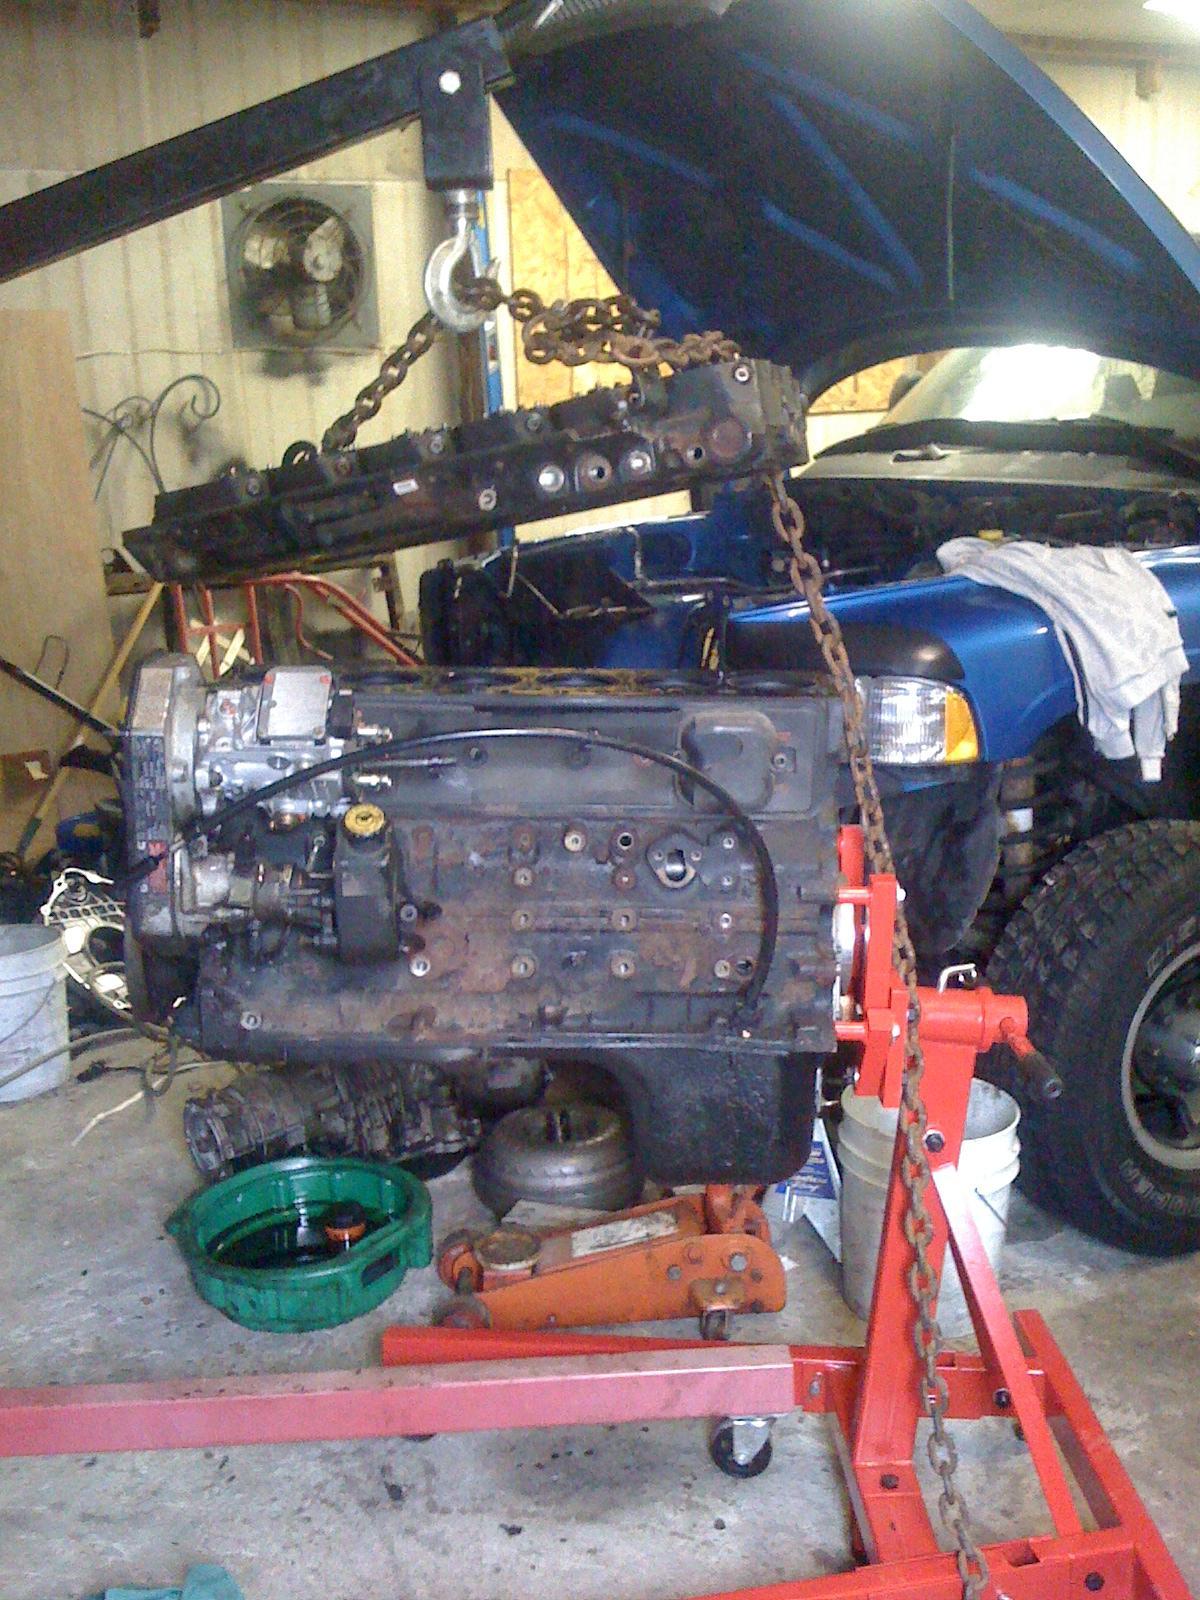 D Cracked Block Swap Picture on Dodge Ram 3500 Diesel